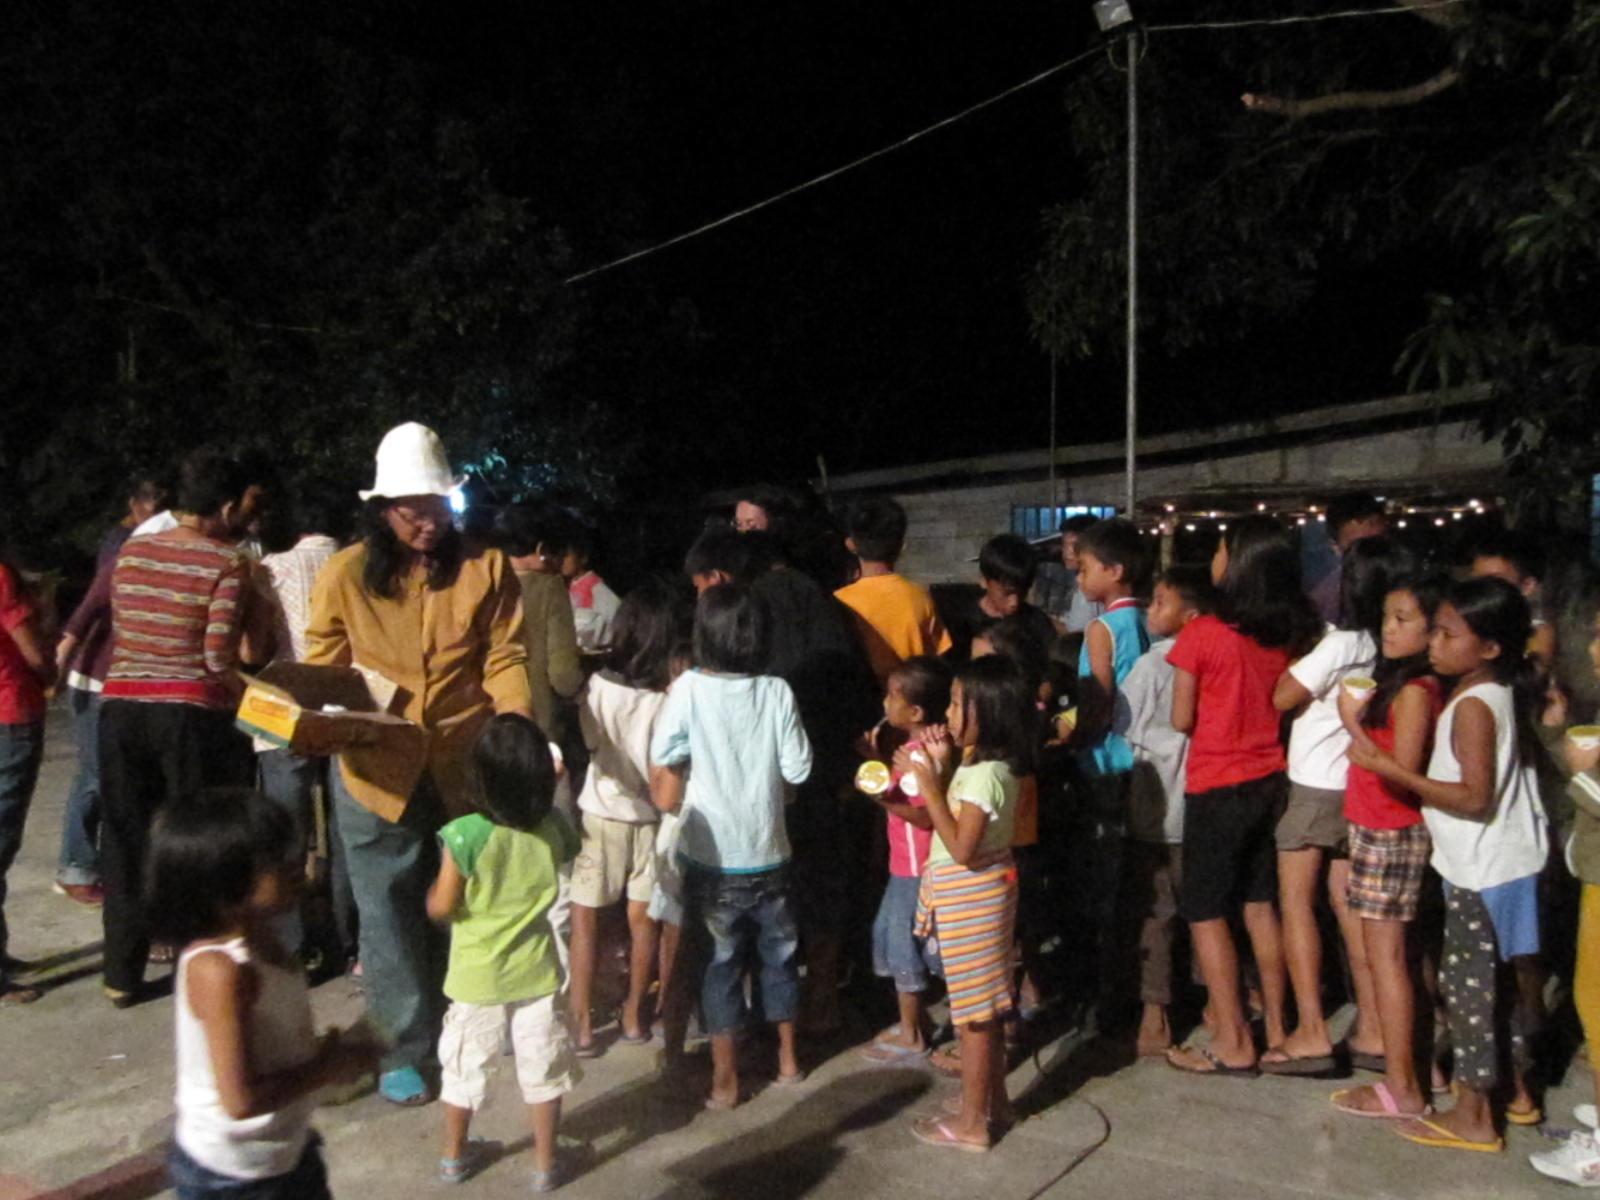 10 Things About Filipino Christmas Parties | ErikaFromAmerica